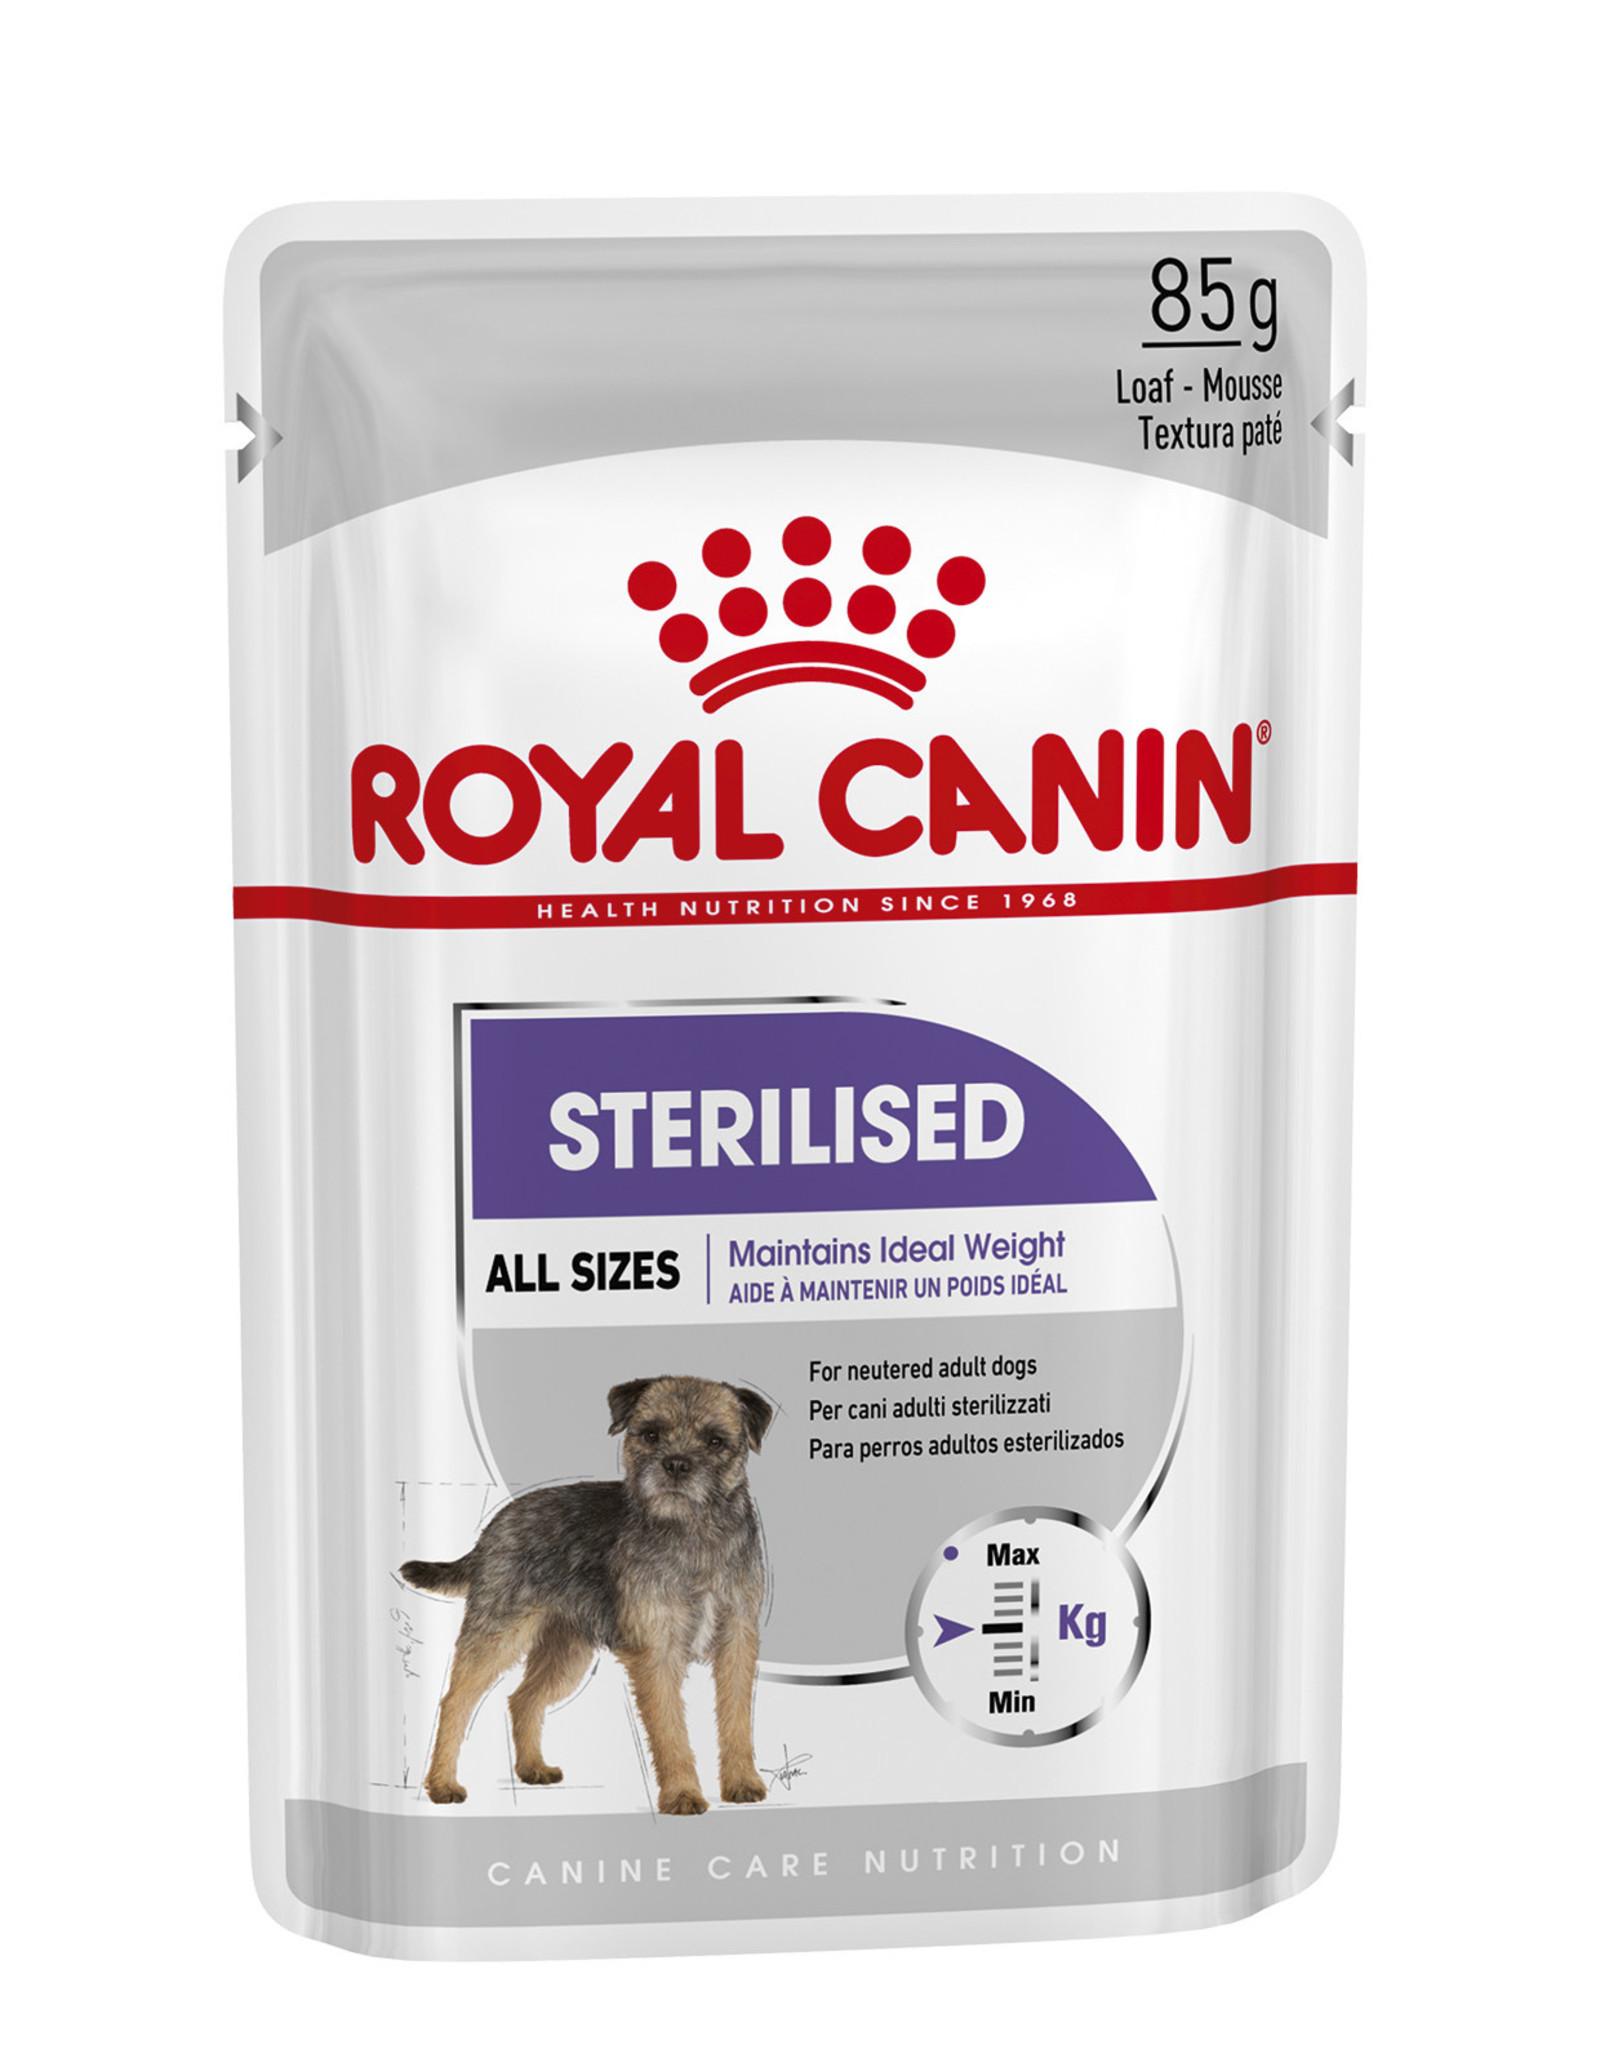 Royal Canin Sterilised Loaf Wet Pouch Dog Food